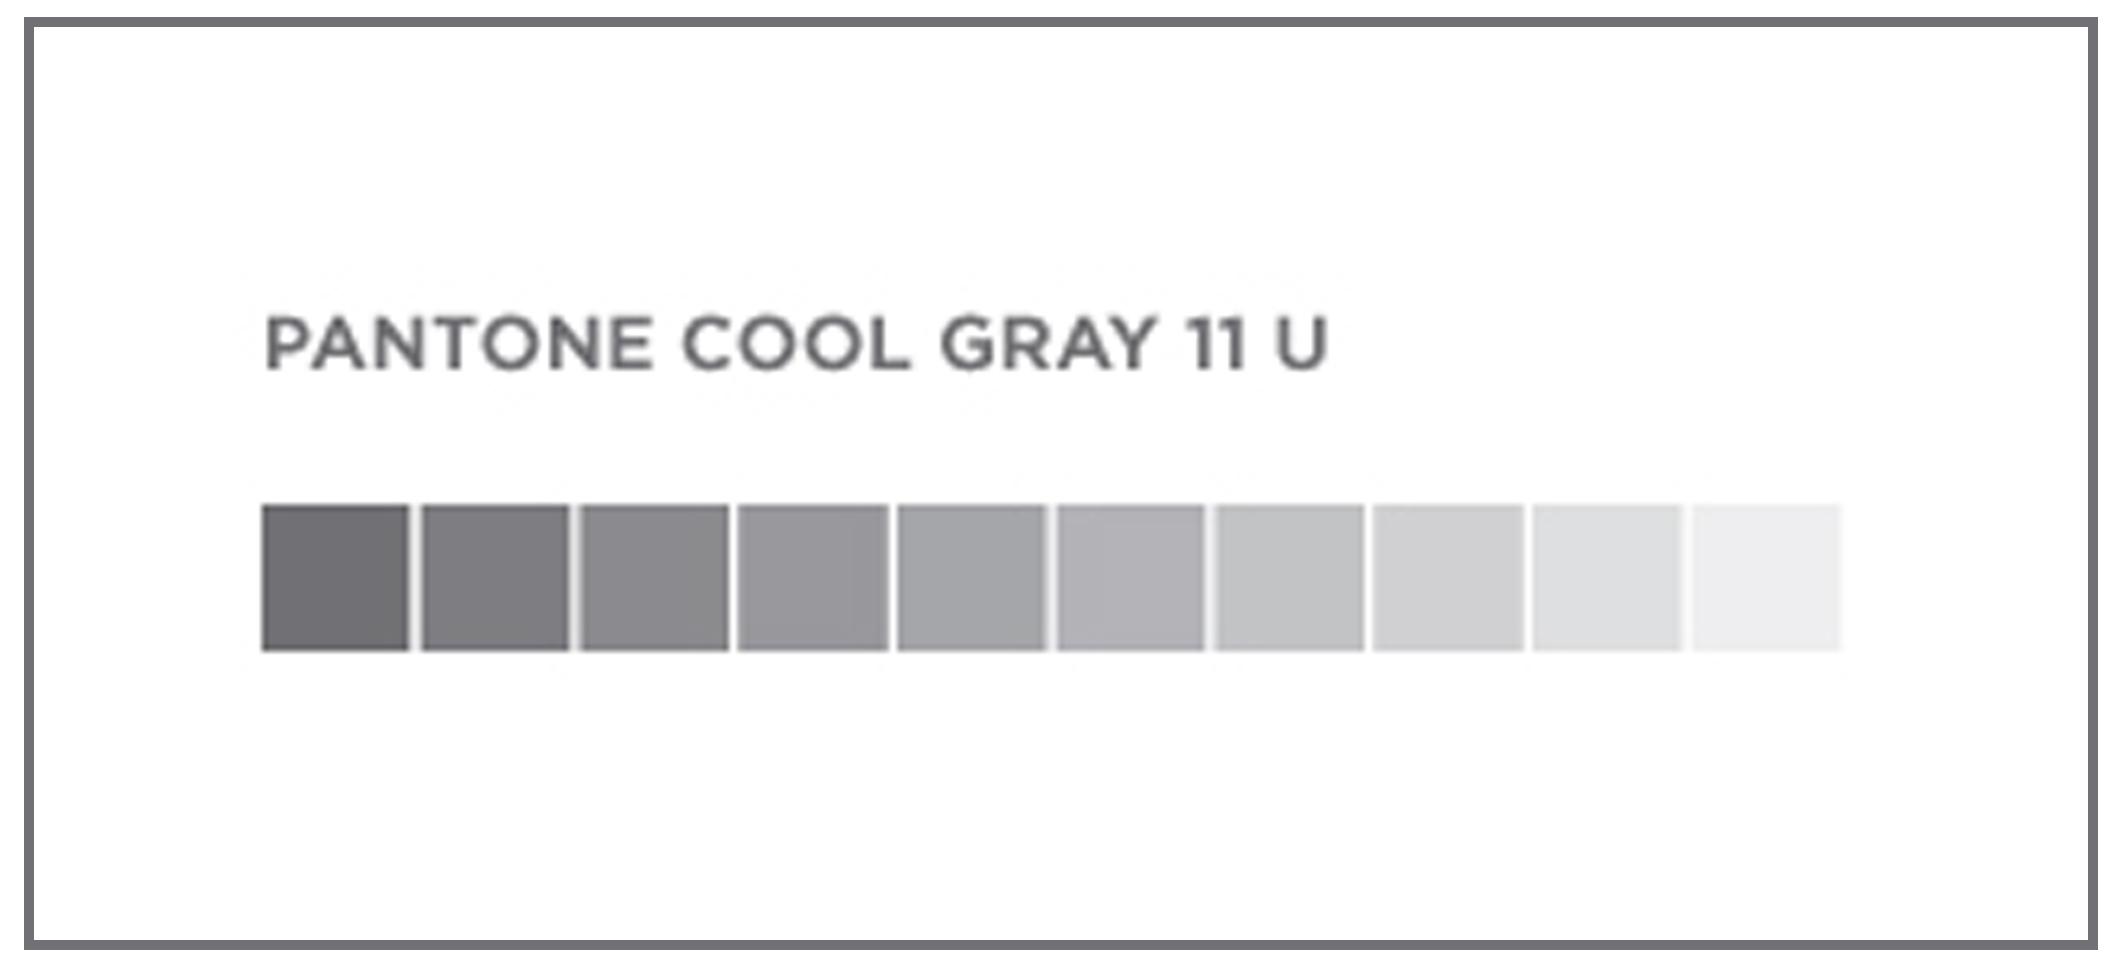 sismak-pantone-cool-gray-11-u